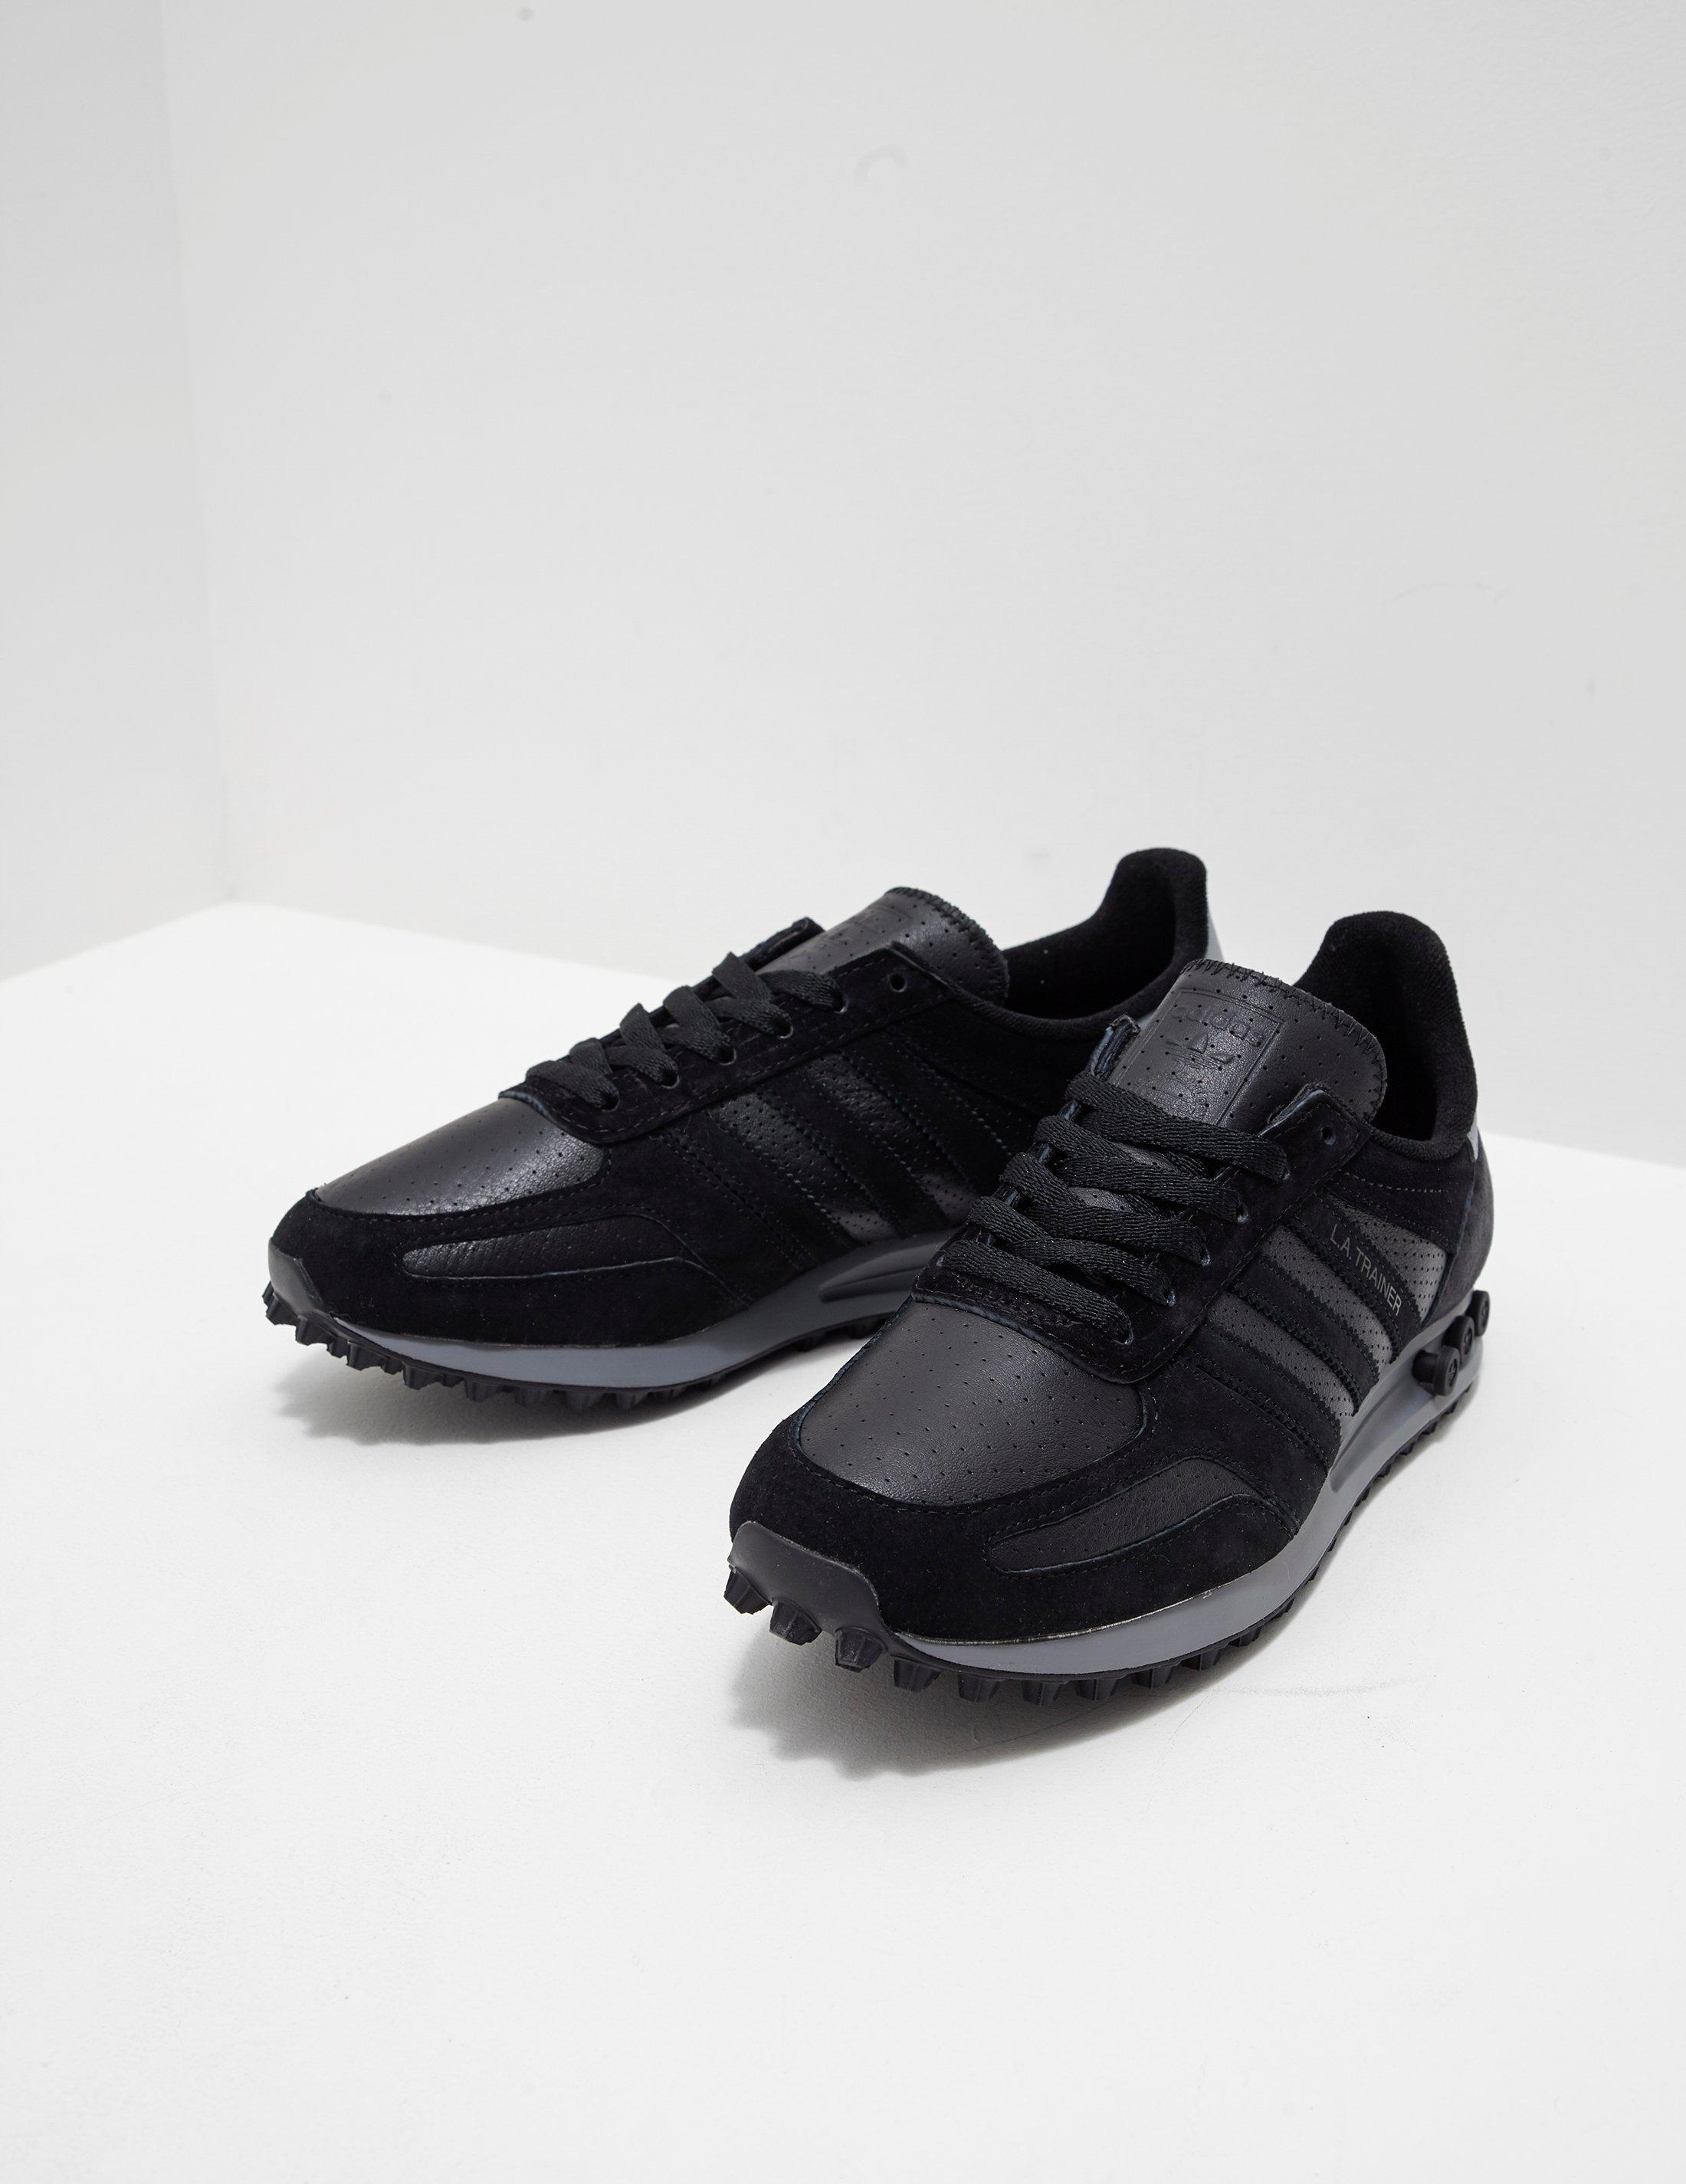 La Trainer Leather Black